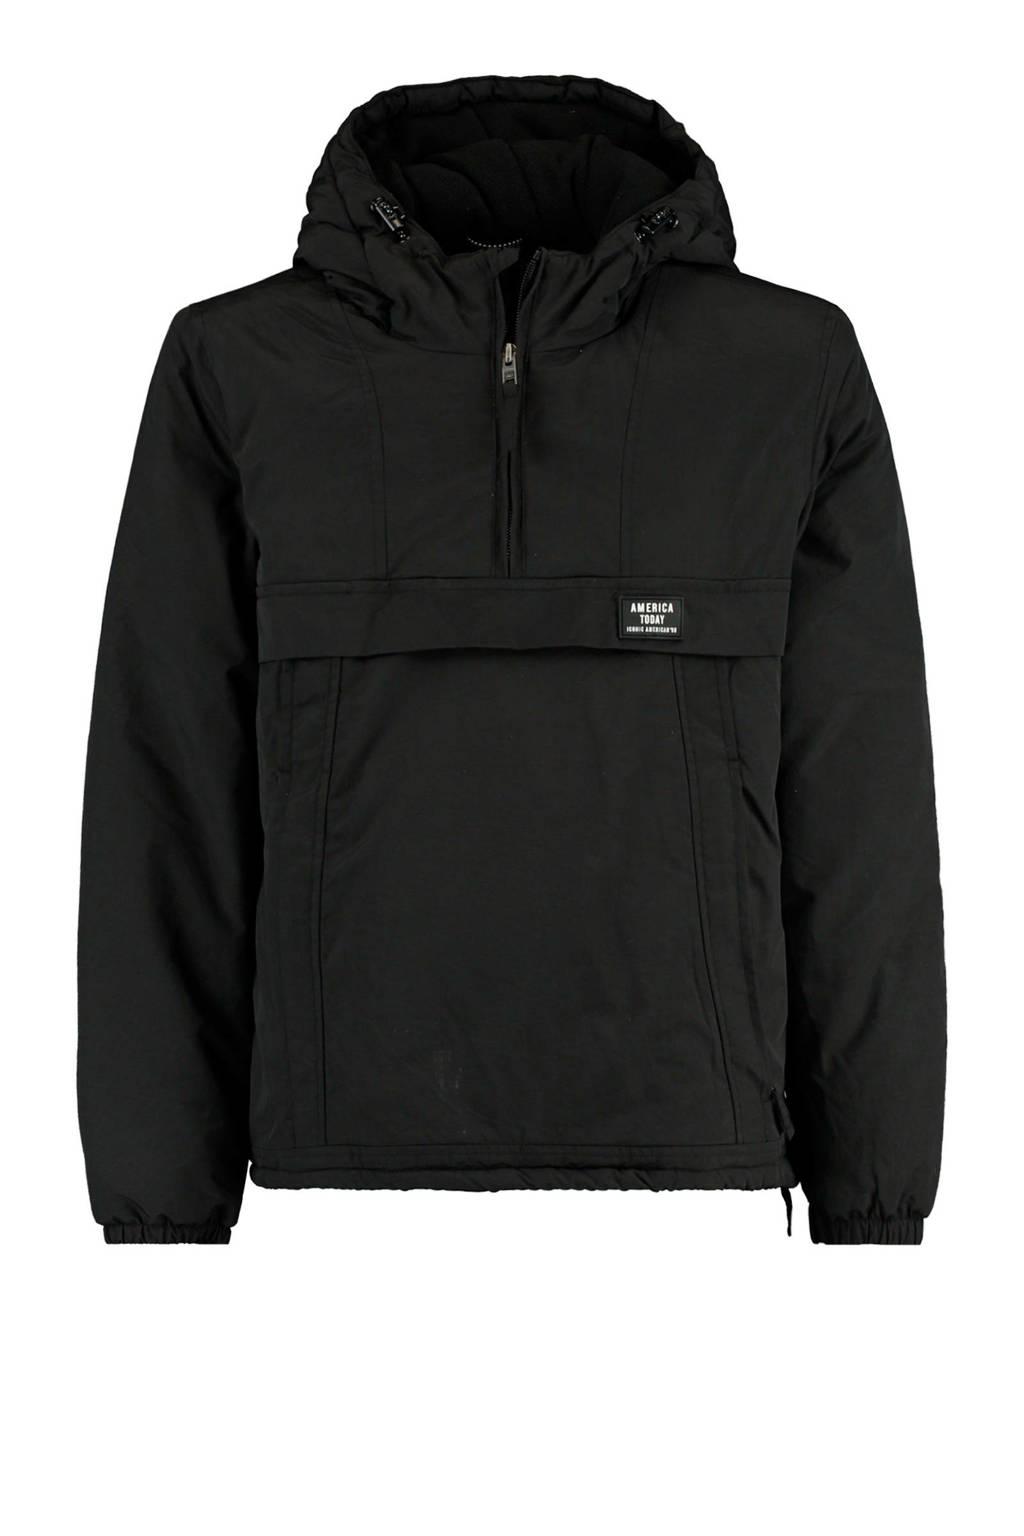 America Today Junior reversible winterjas Jense zwart, Zwart